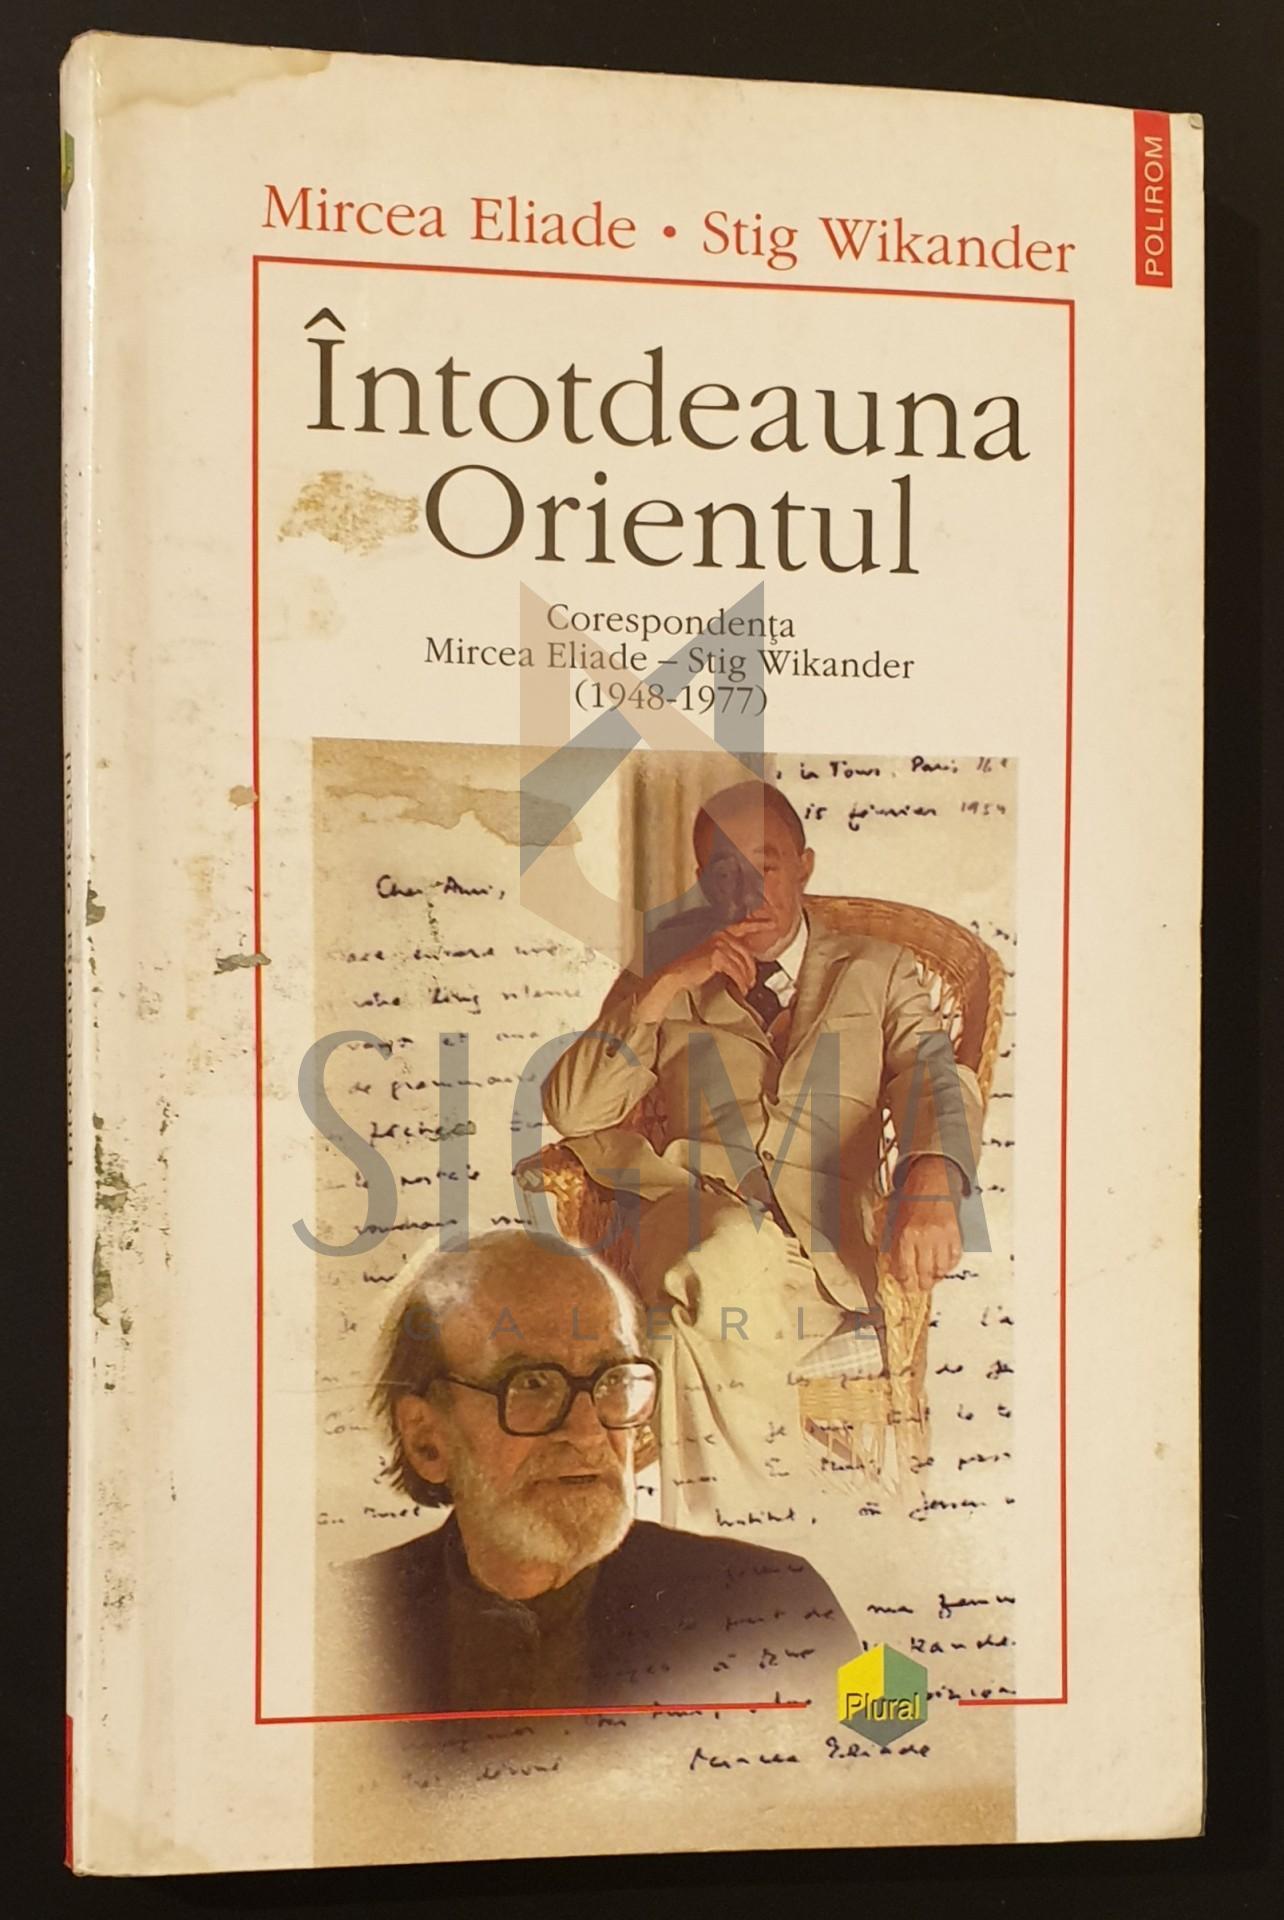 Intotdeauna Orientul  *  Corespondenta Mircea Eliade - Stig Wikander (1948-1977)